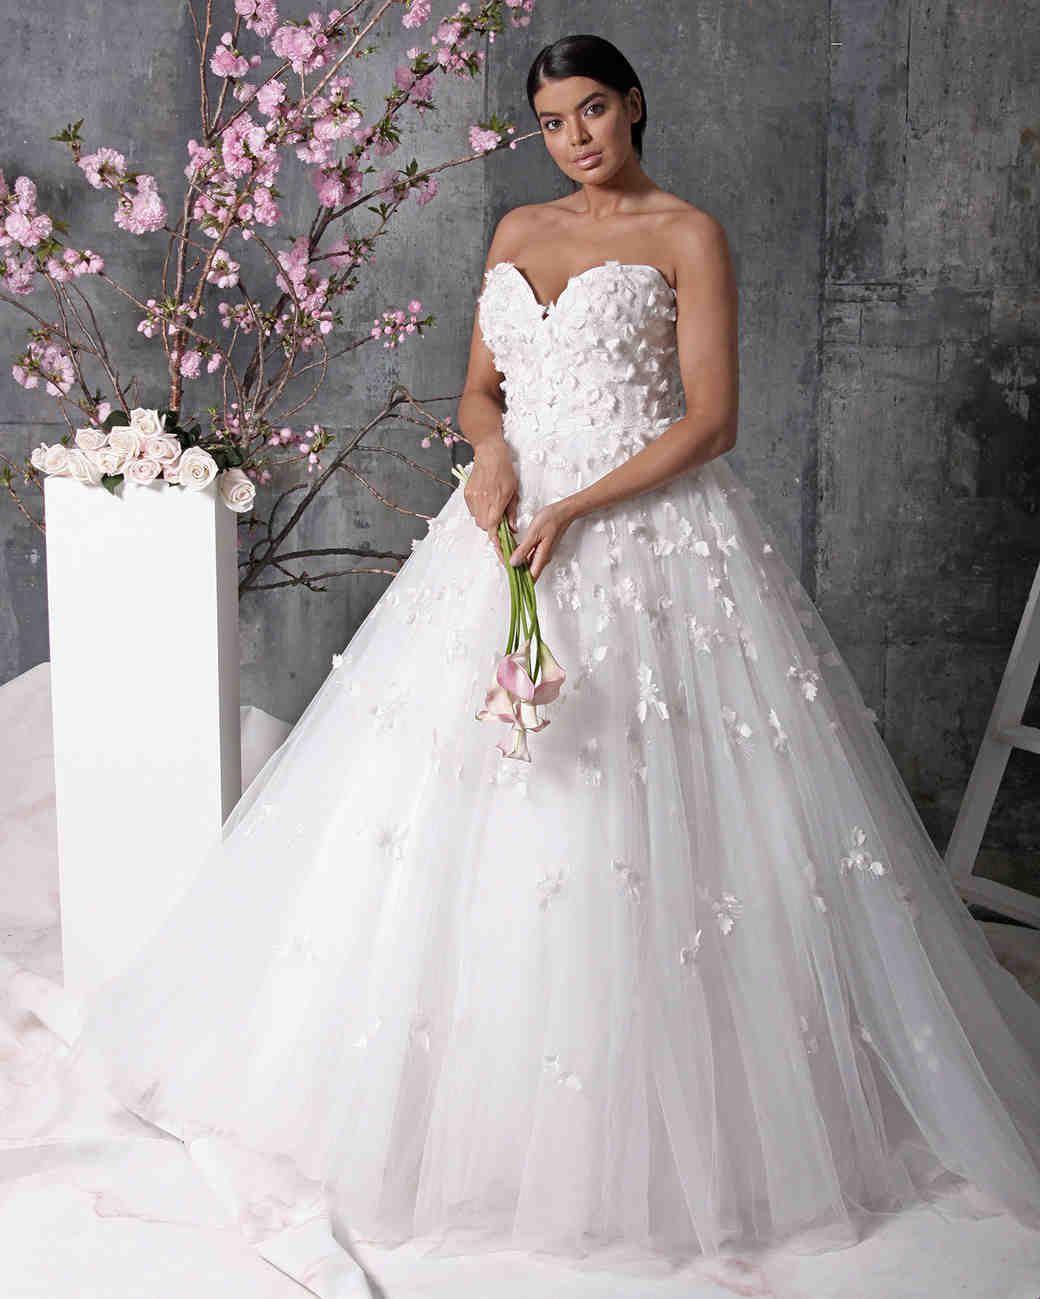 Christian Siriano Spring 2018 Wedding Dress Collection Christian Siriano Wedding Dresses Bridal Style Designer Wedding Dresses [ 1299 x 1040 Pixel ]